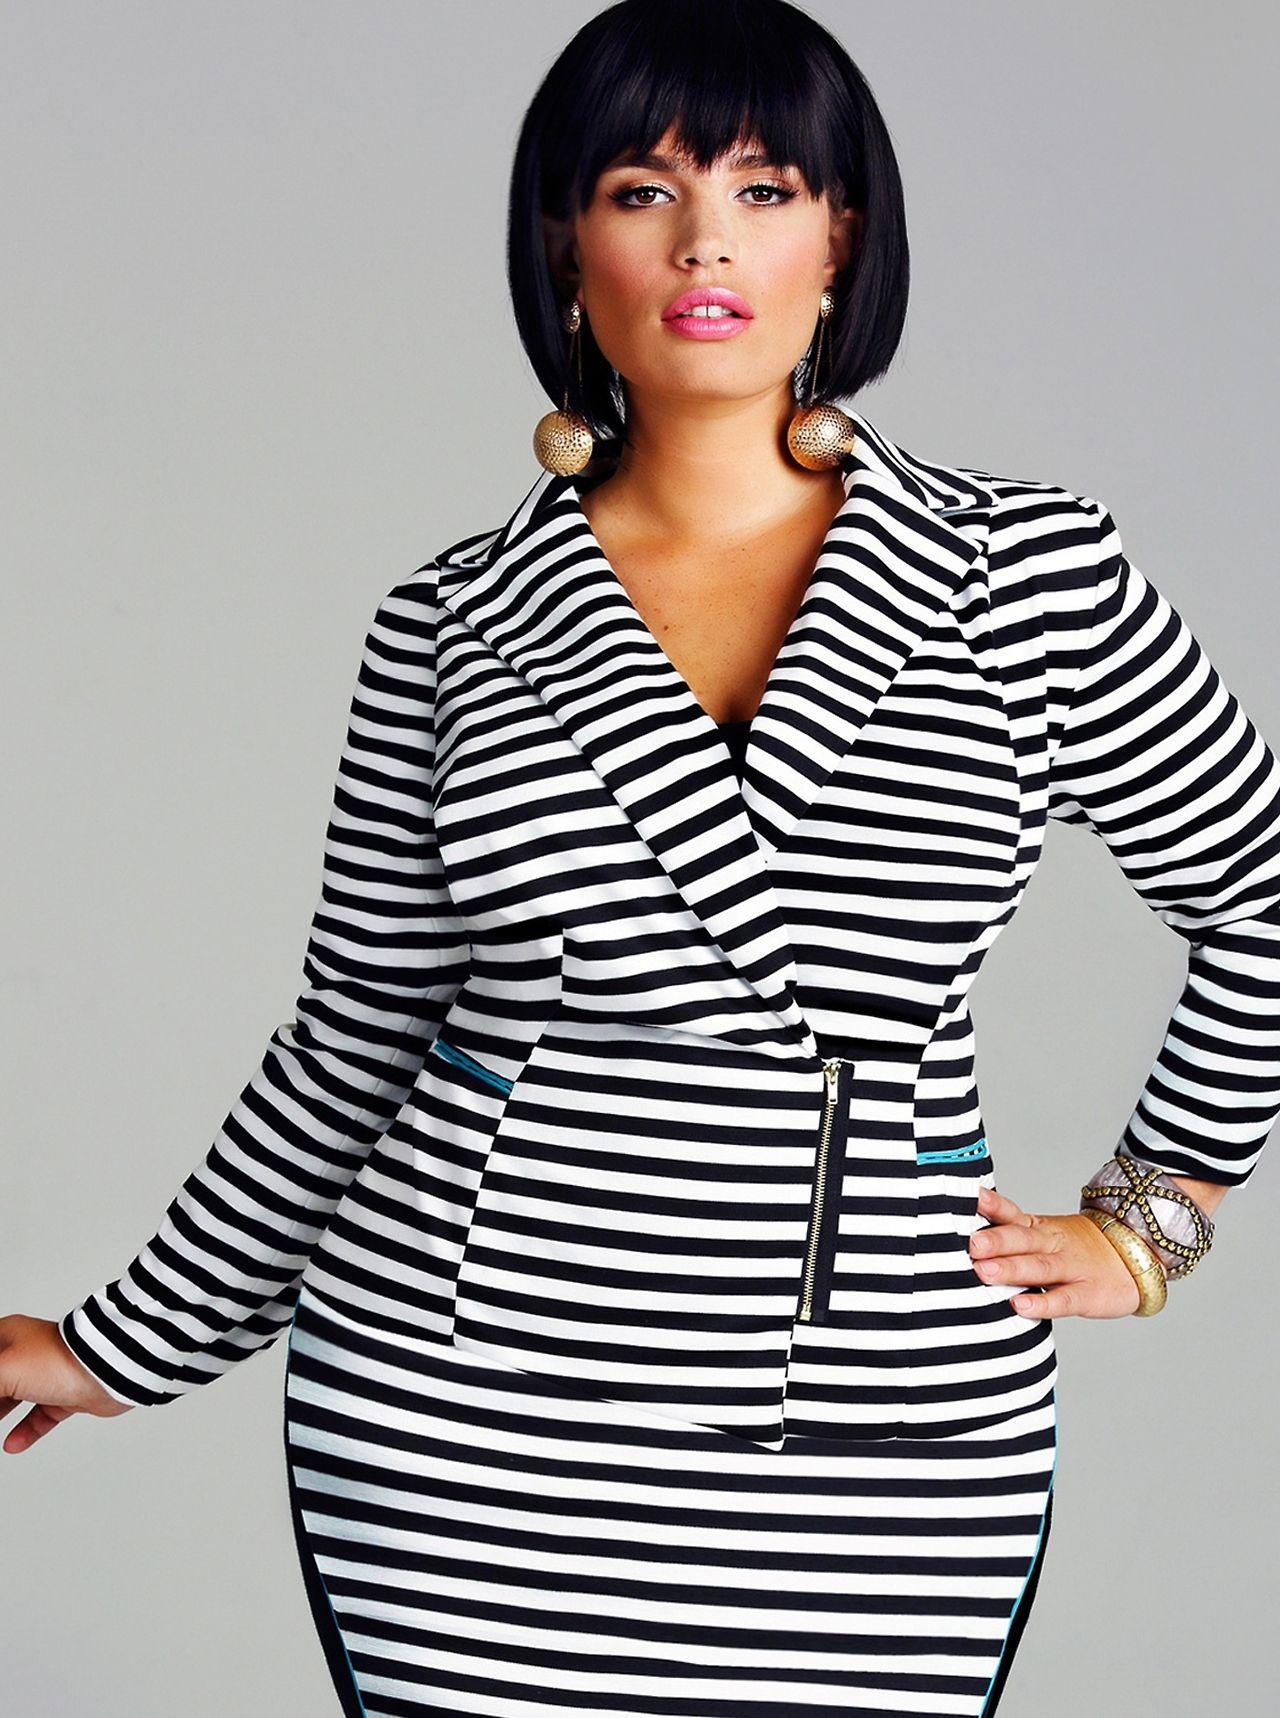 Clementine Desseaux In Veronica Ponte Zipper Front Blazer Stripe Estilos Para Tallas Grandes Estilo De Chica Con Curvas Moda Xxl